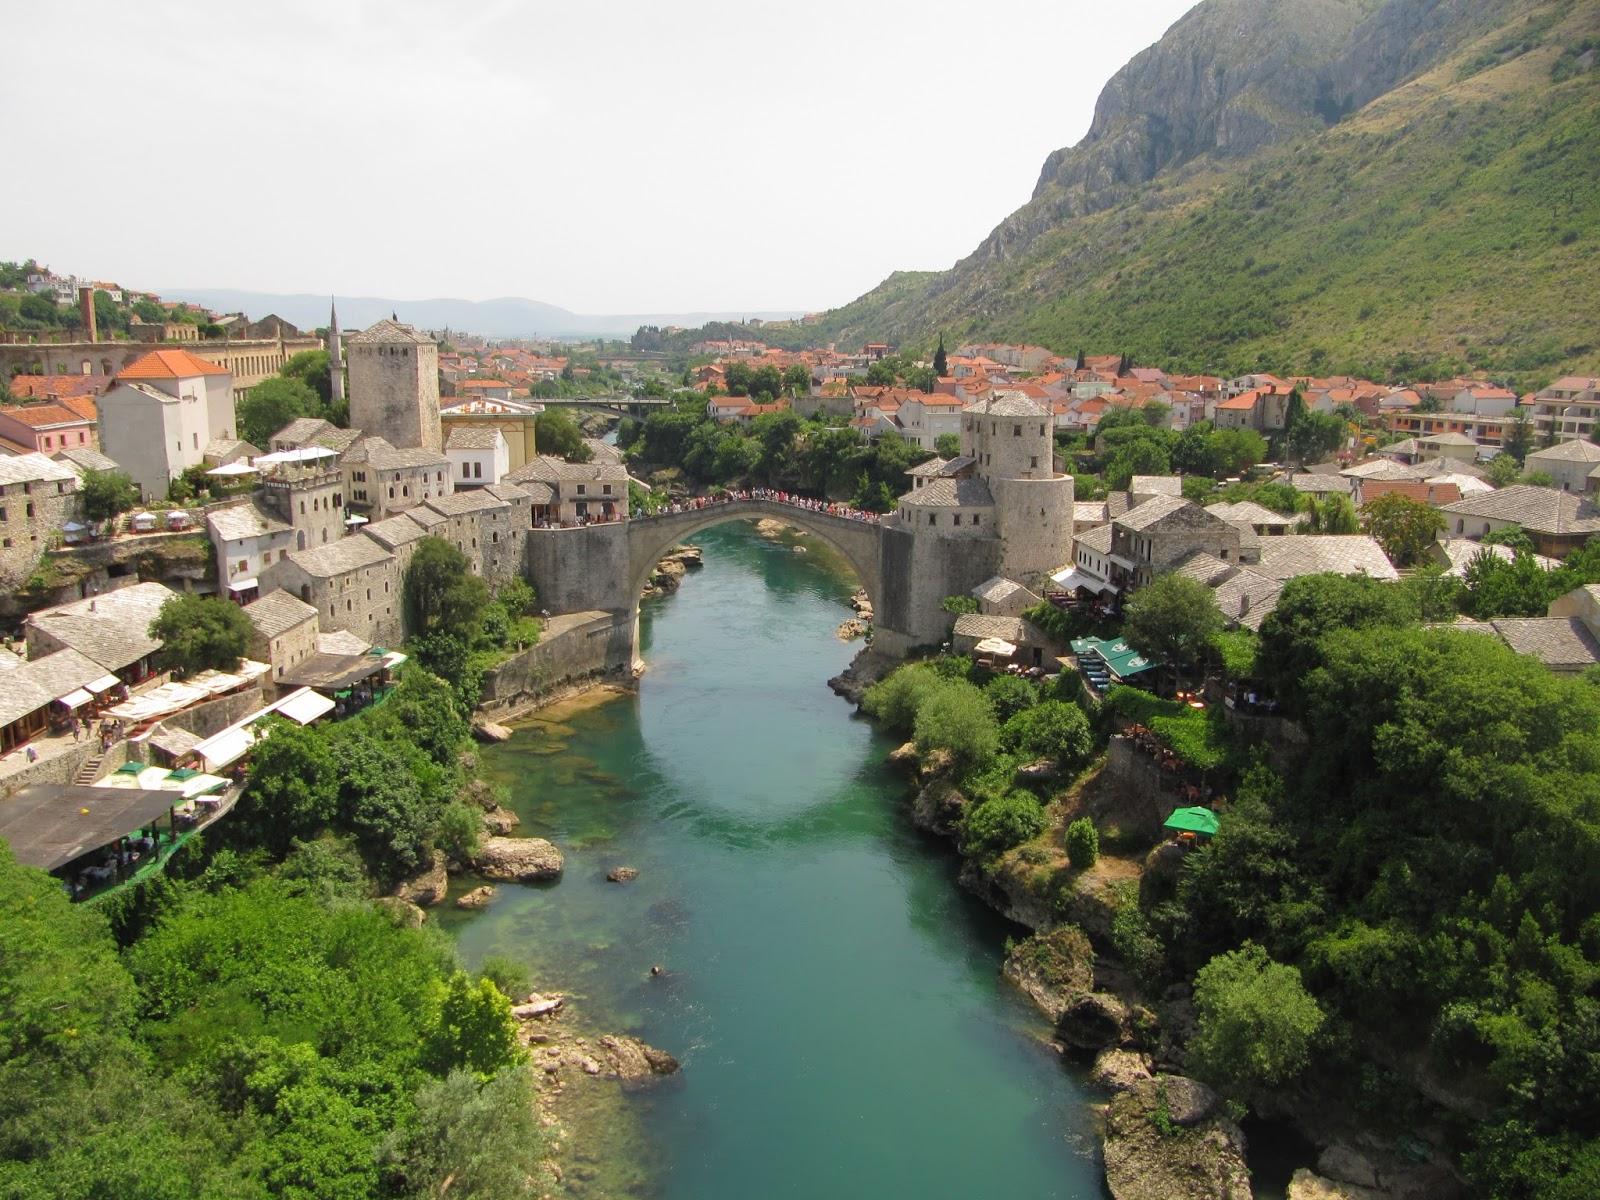 Mostar Bosnia  city photos gallery : desenvolturasedesacatos: Mostar, Bósnia e Herzegovina.